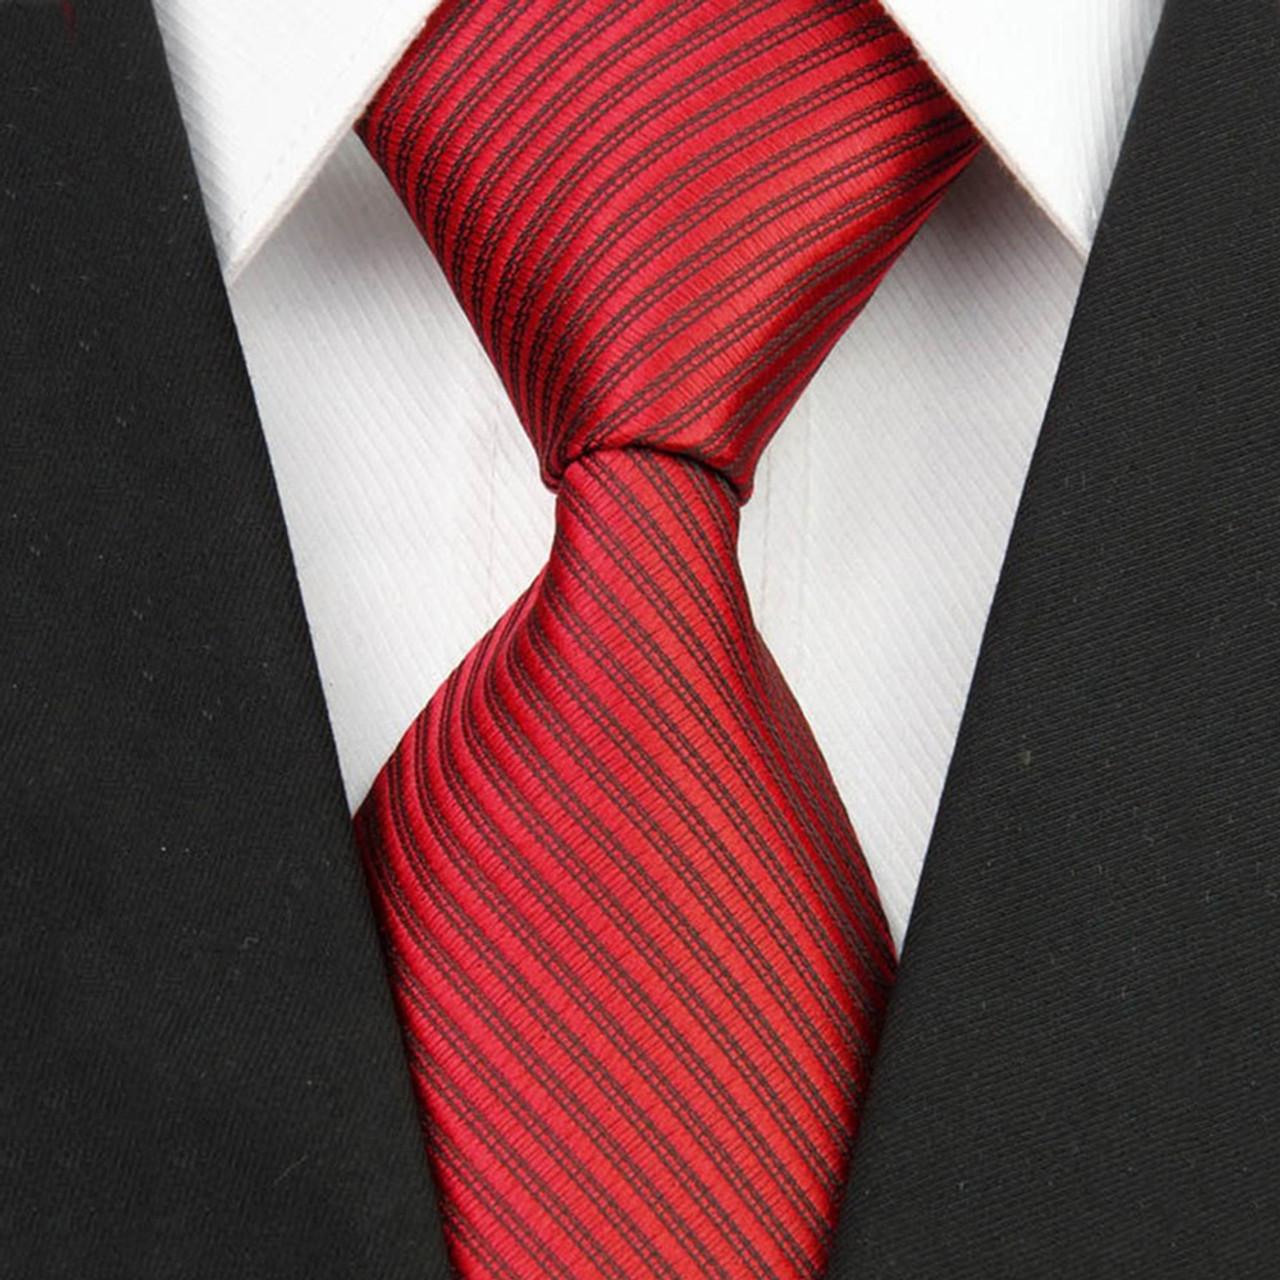 New Wide Silk Ties for Men Striped Solid 10cm Men's Neckties Business Red  Wedding Suit Neck Tie Black White Blue Gravatas - OnshopDeals.Com